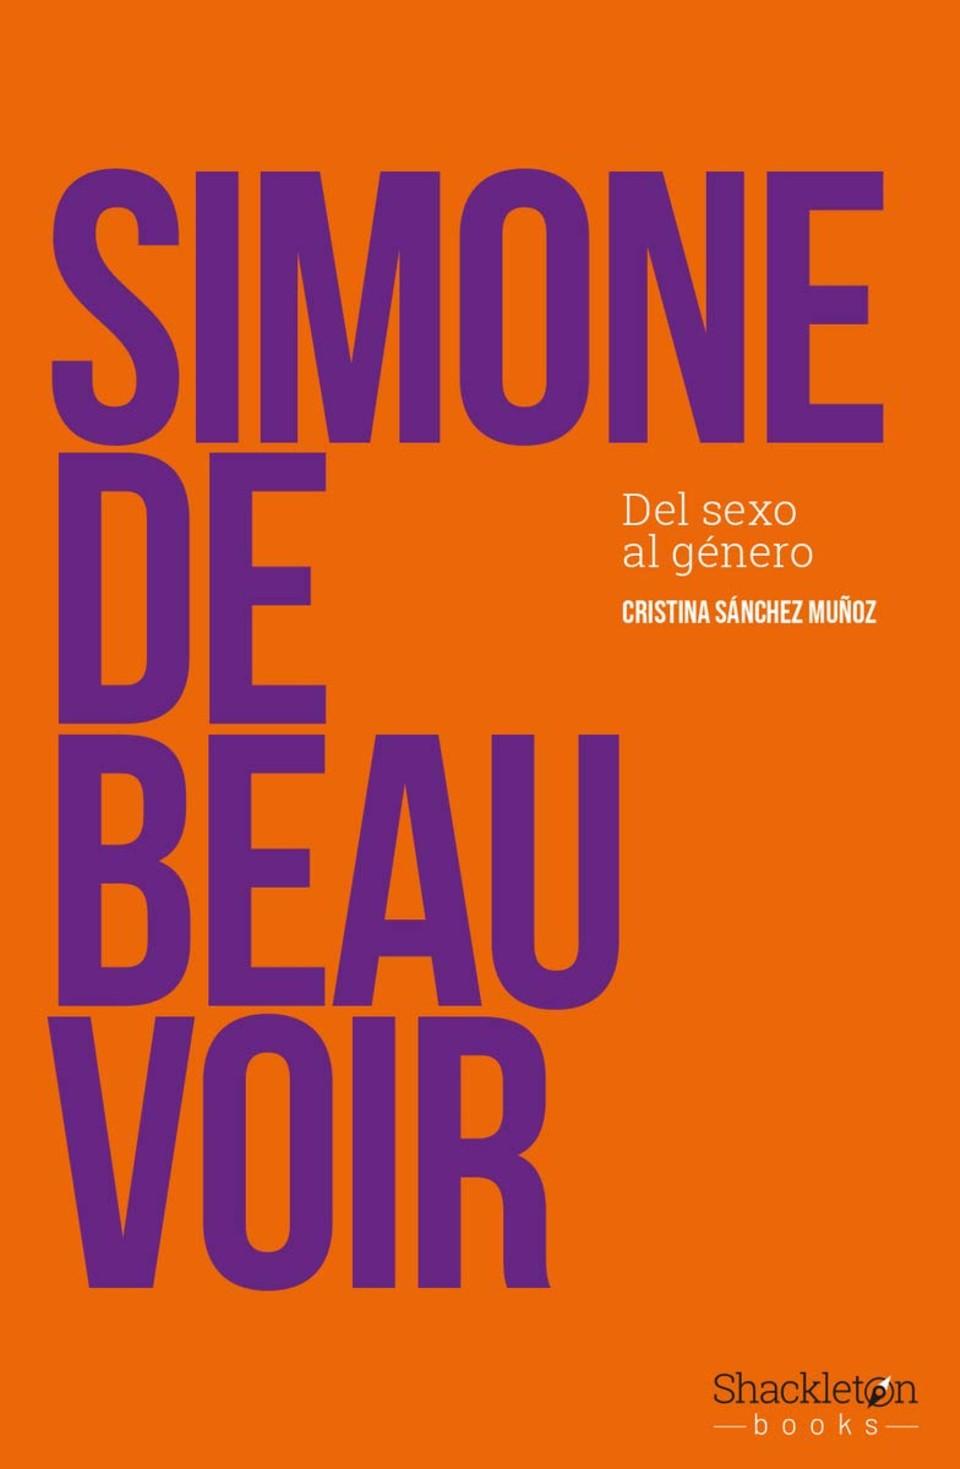 Simone de Beauvoir: del sexo al género, de Cristina Sánchez